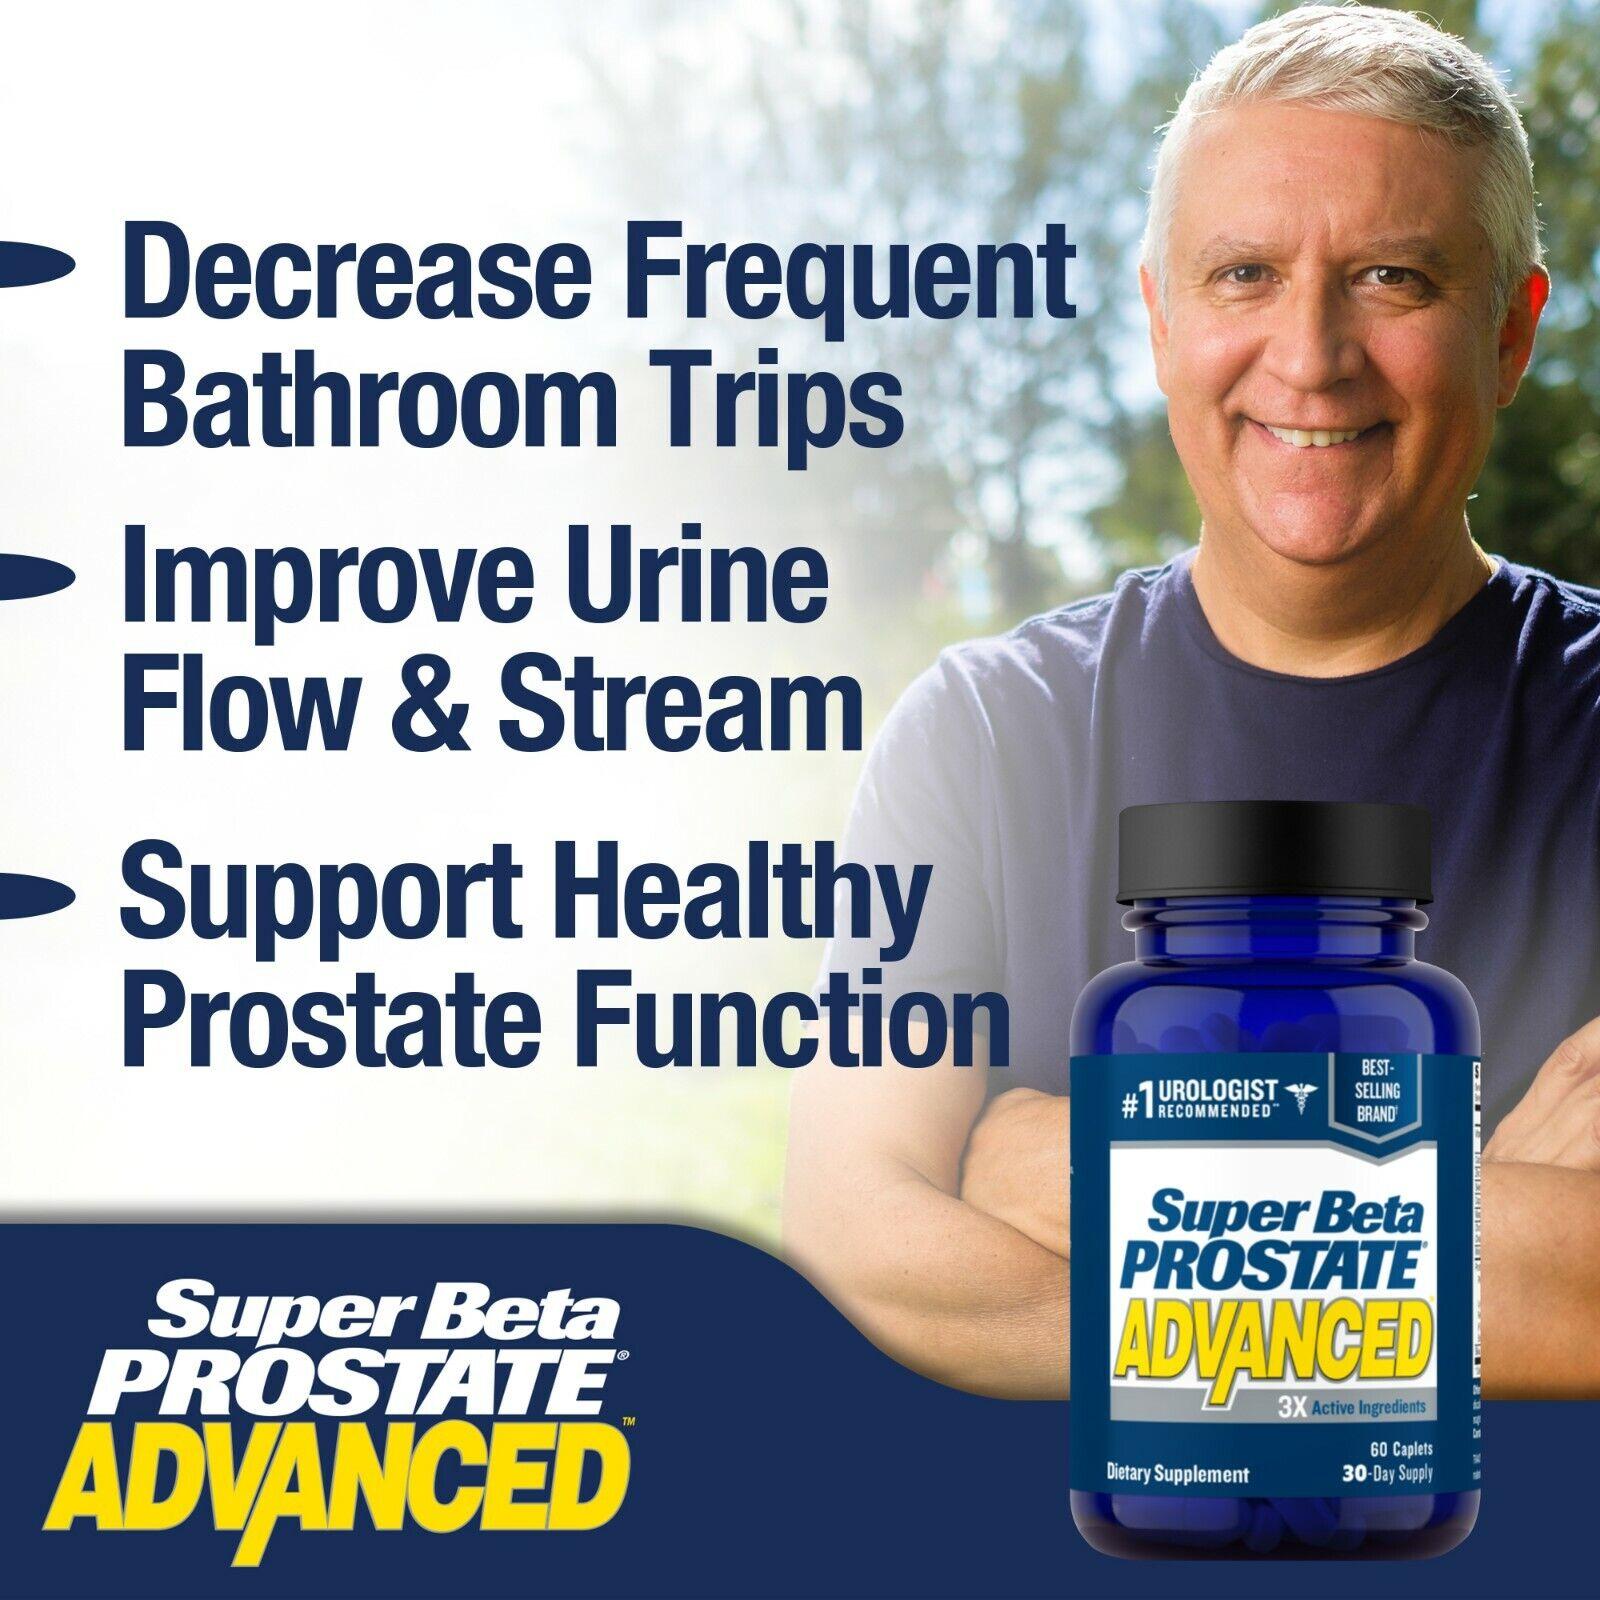 Super Beta Prostate Advanced - Prostate Supplement - Brand New - Free S&H 2